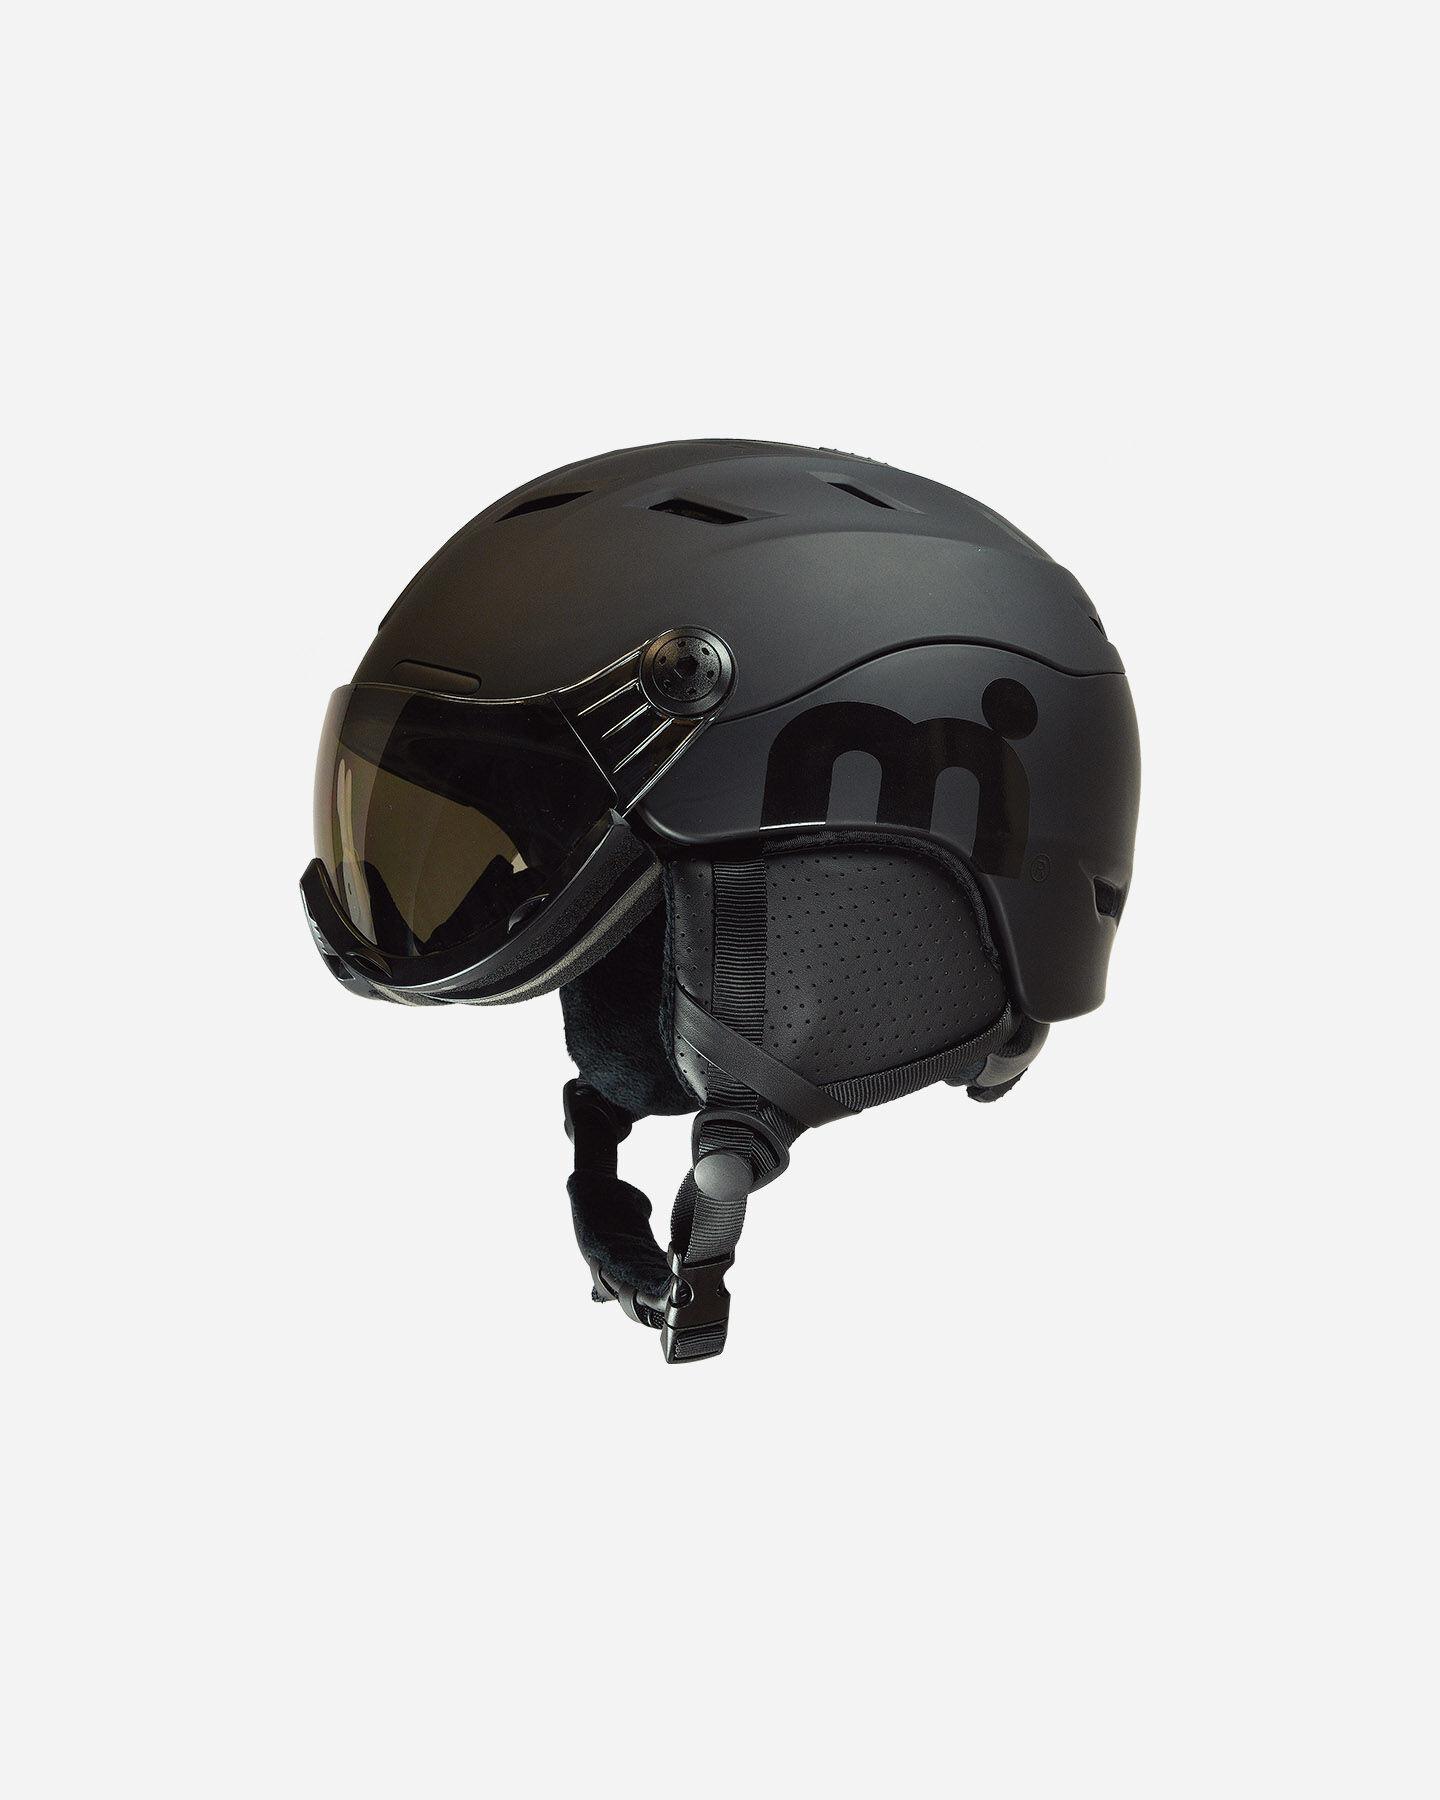 casco esqui oakley